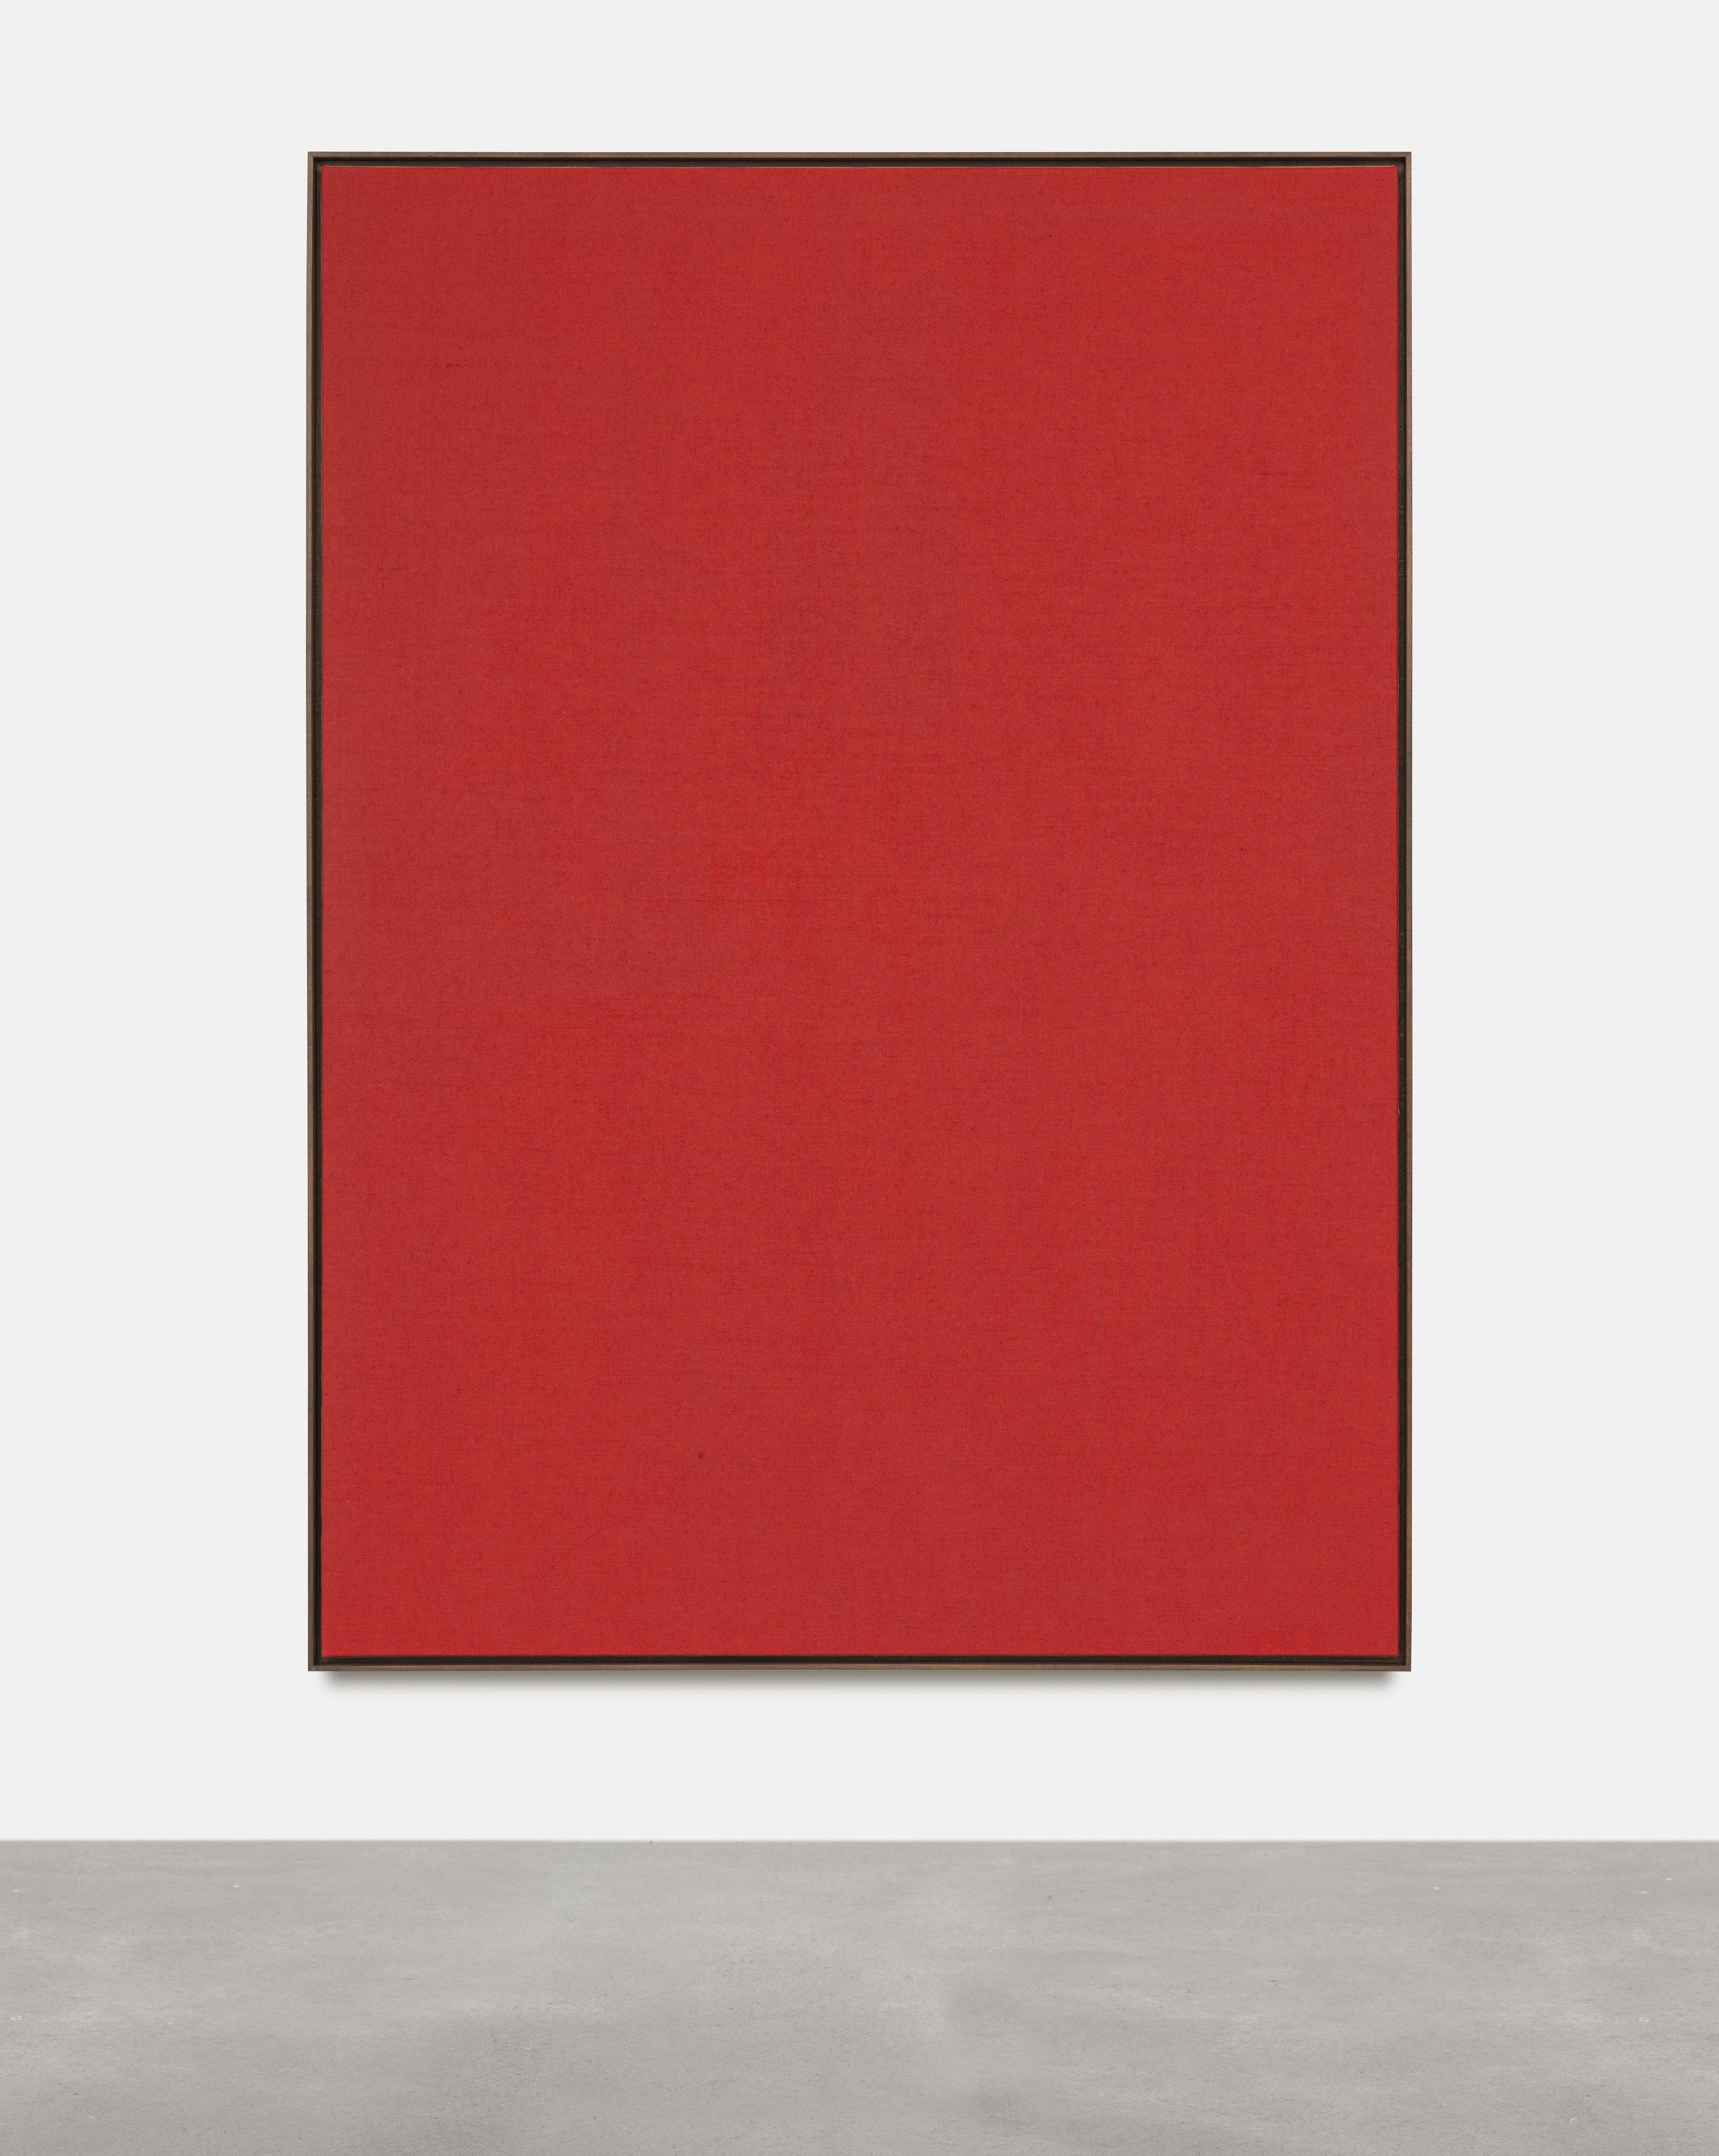 Antonio Ballester Moreno Red, 2021 Acrylic on jute 200×145 cm, Unique.